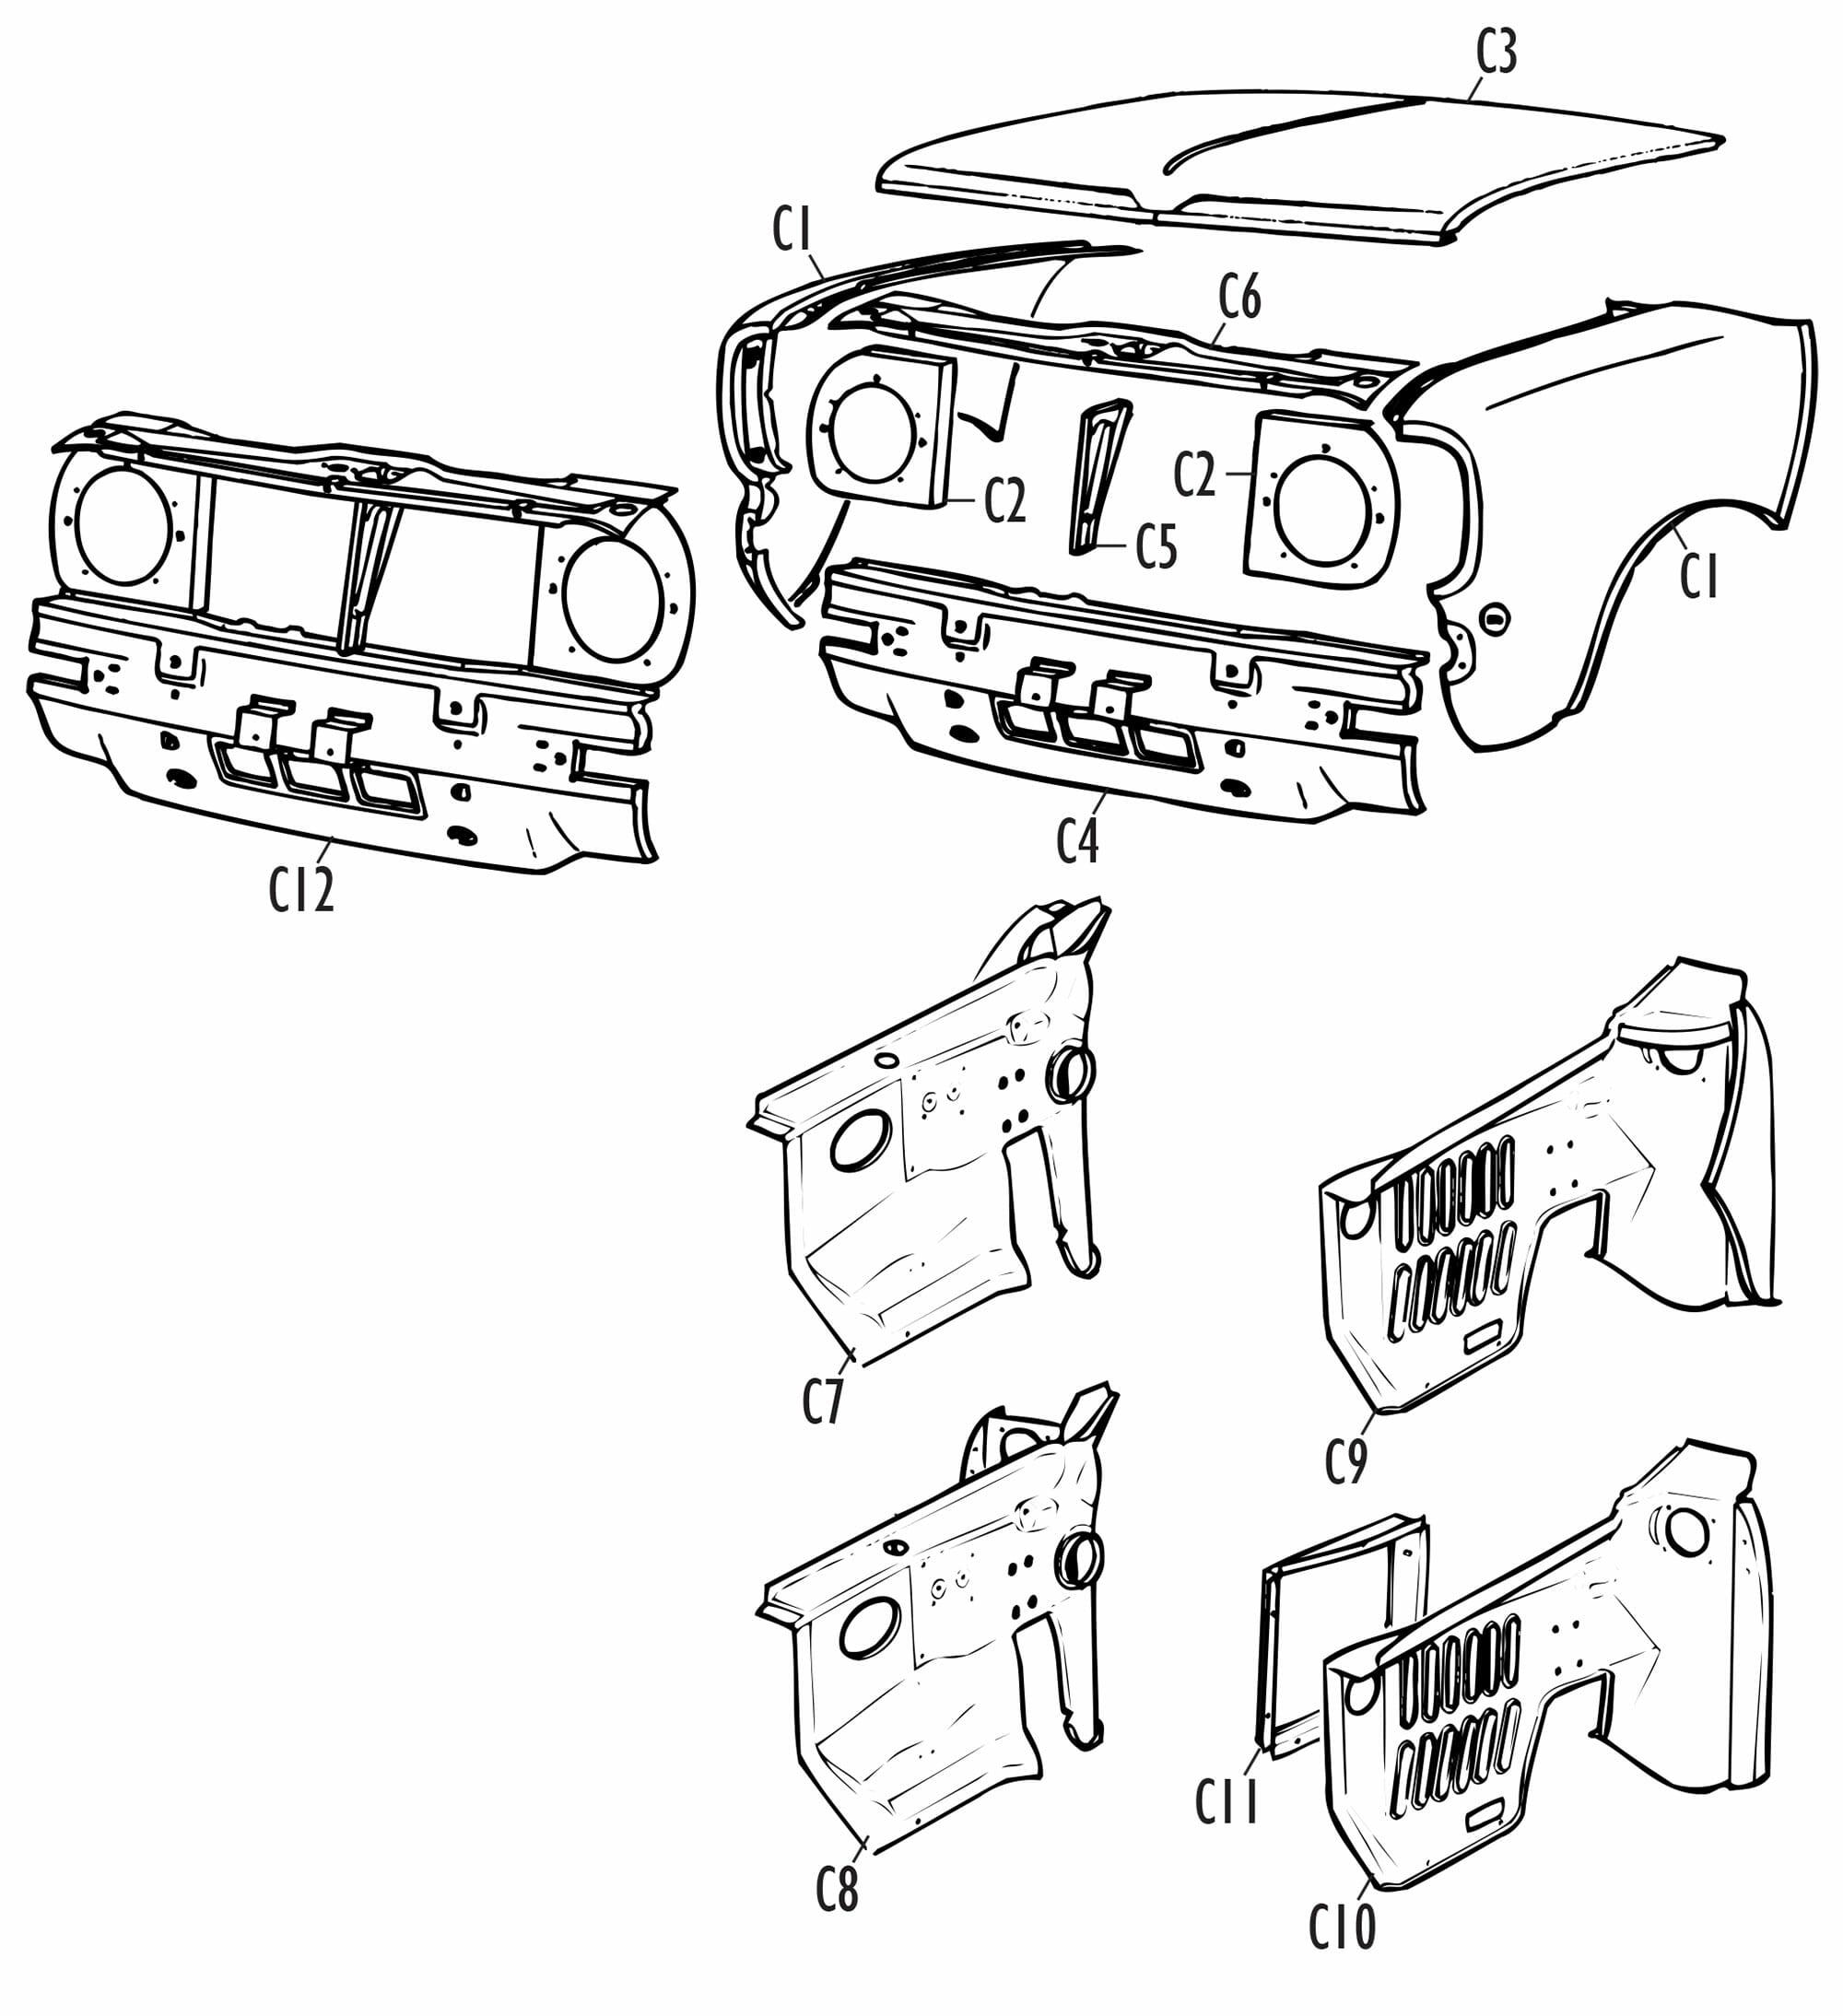 Mini Parts - Clubman Specific Panels